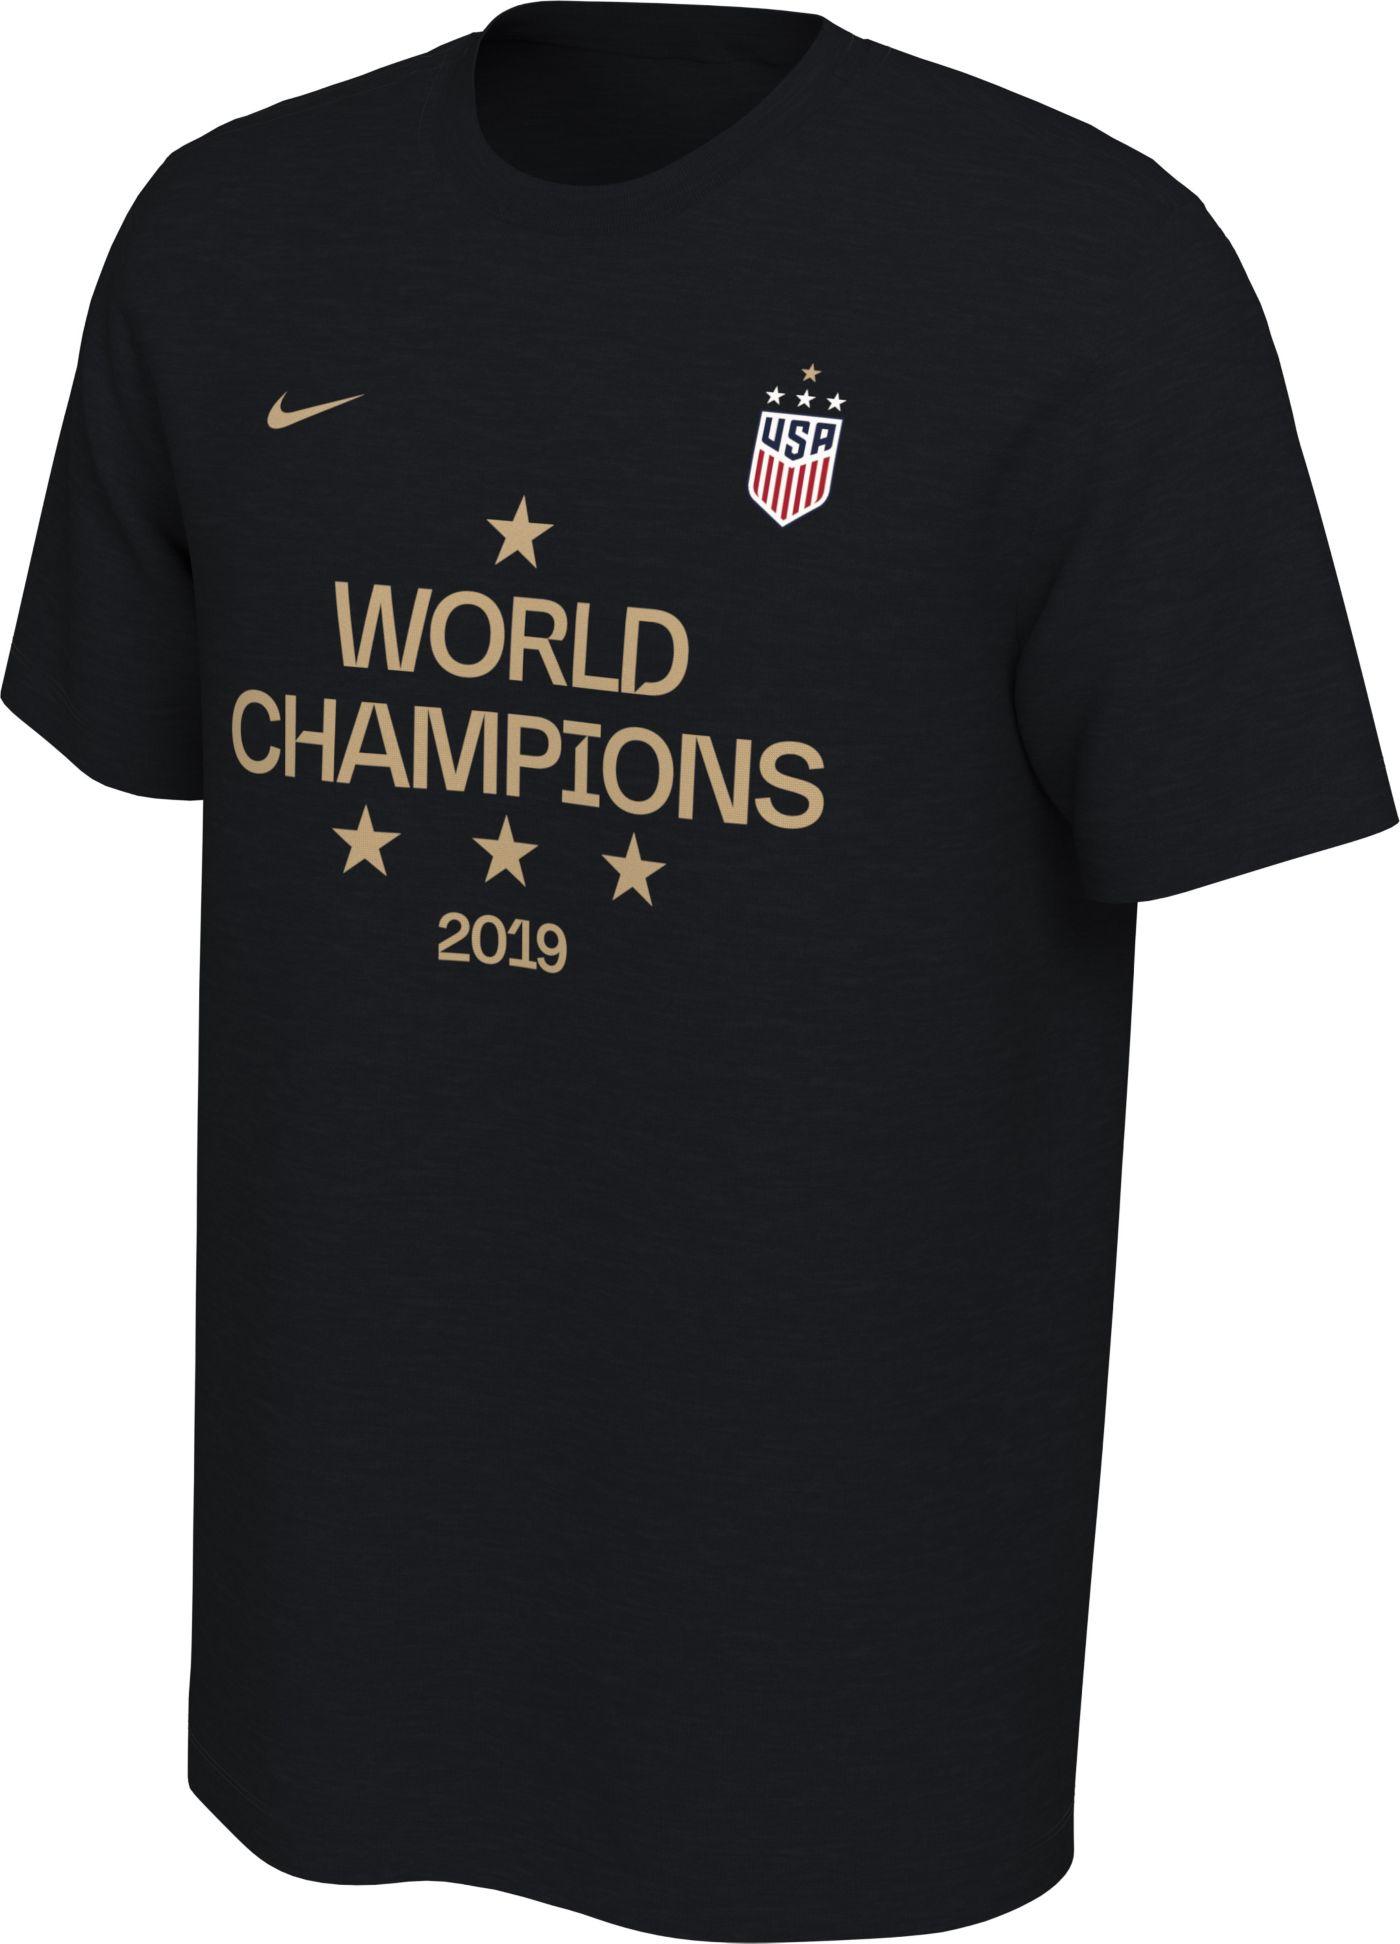 Nike Men's 2019 FIFA Women's World Cup Champions USA Soccer Black T-Shirt